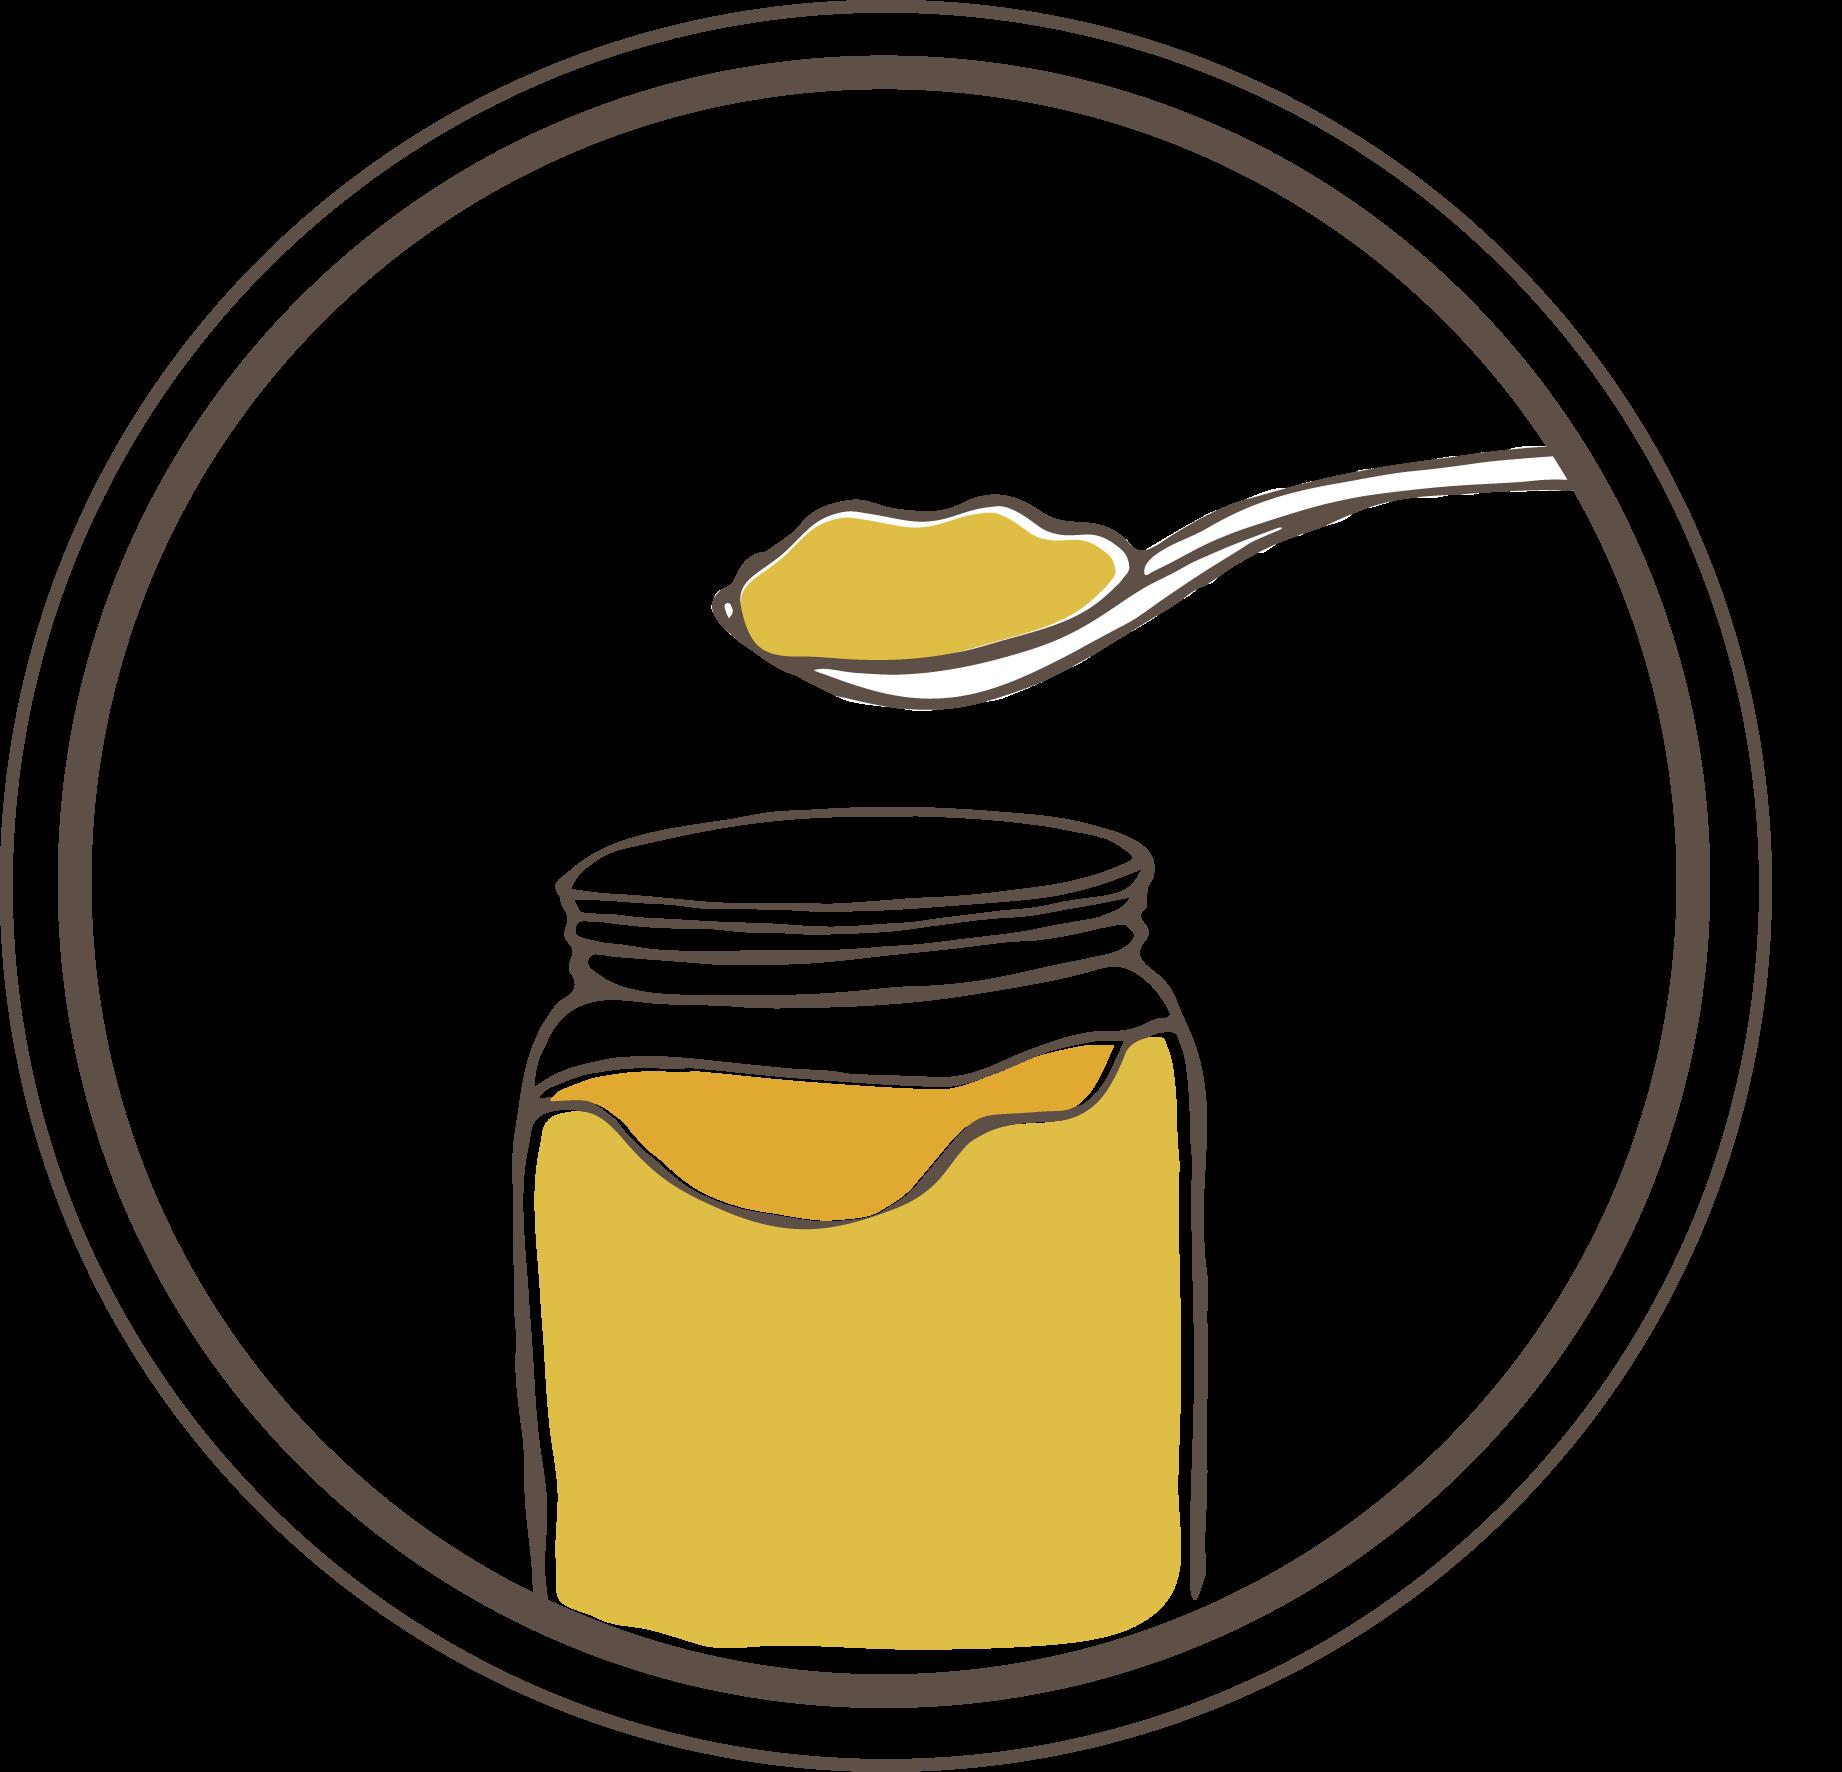 it gels, by owen keturah for bonafide provisions